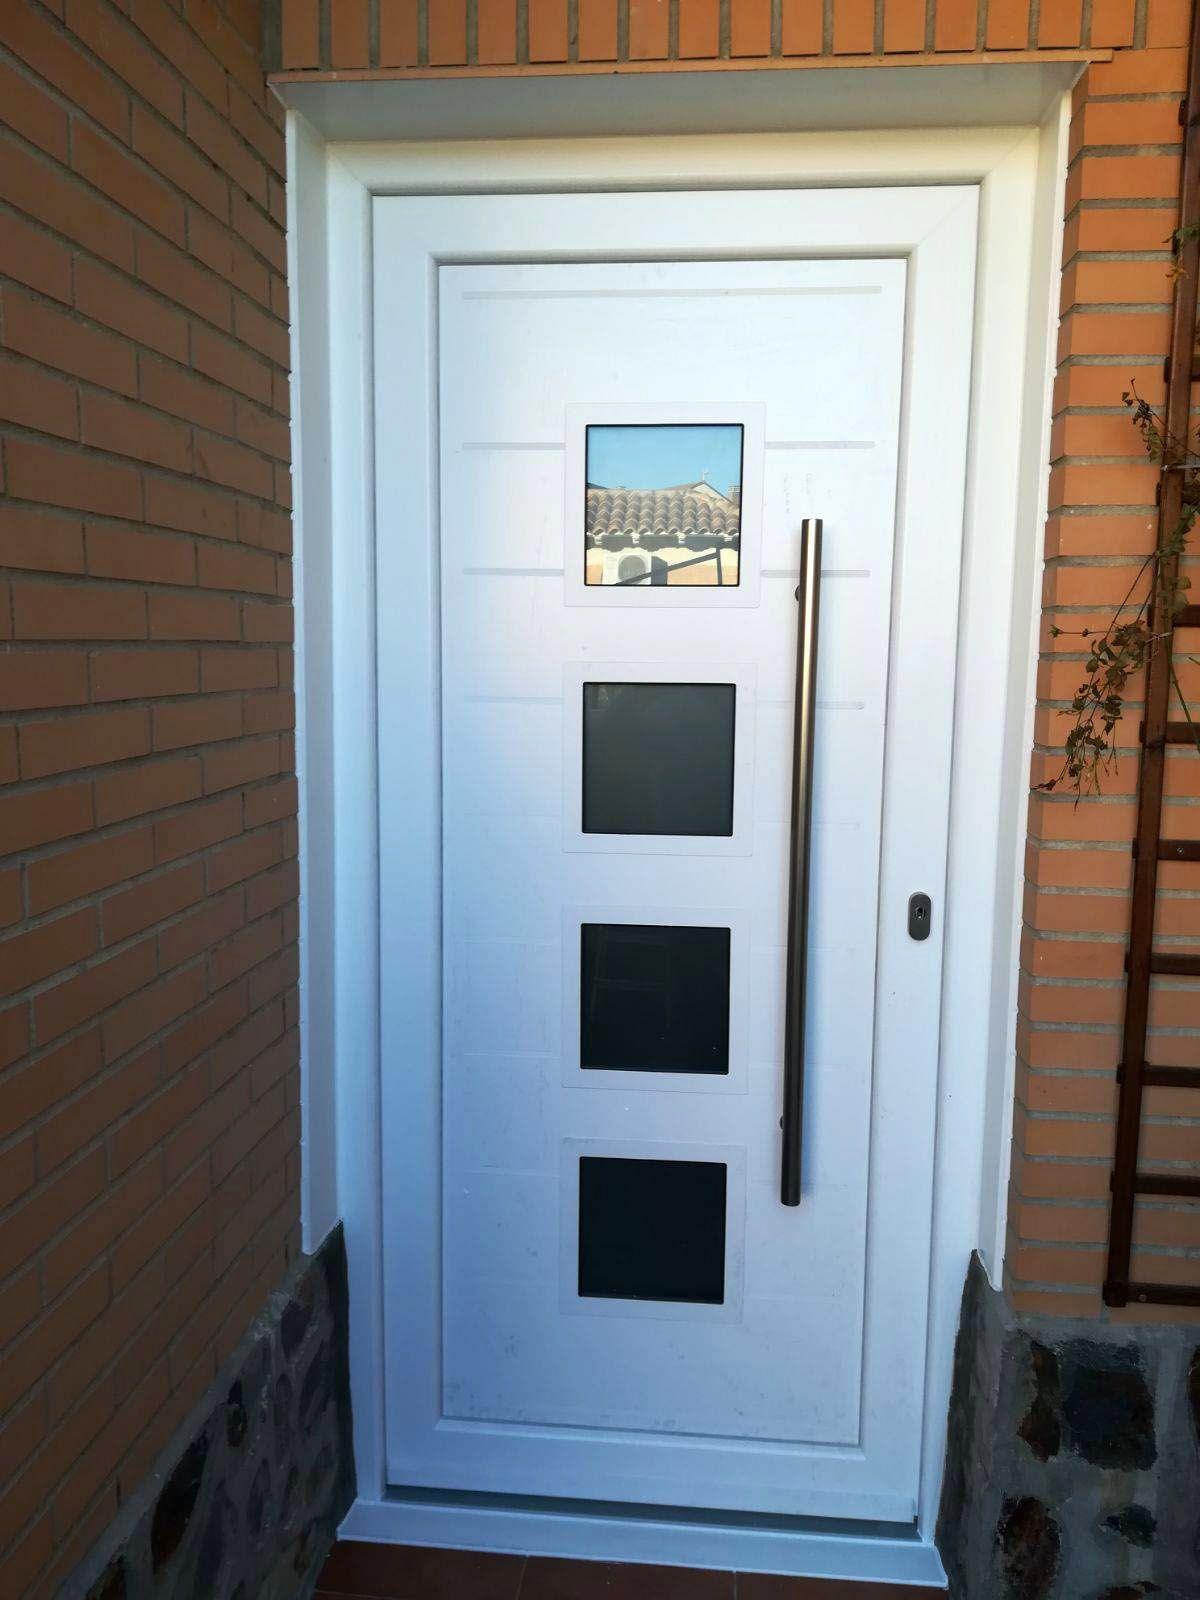 Avant Garona Tipo Lido Ranurado En Aluminio Lacado En Blanco Toledo Puertas De Aluminio Modernas Puertas De Entrada Aluminio Puertas De Aluminio Exterior